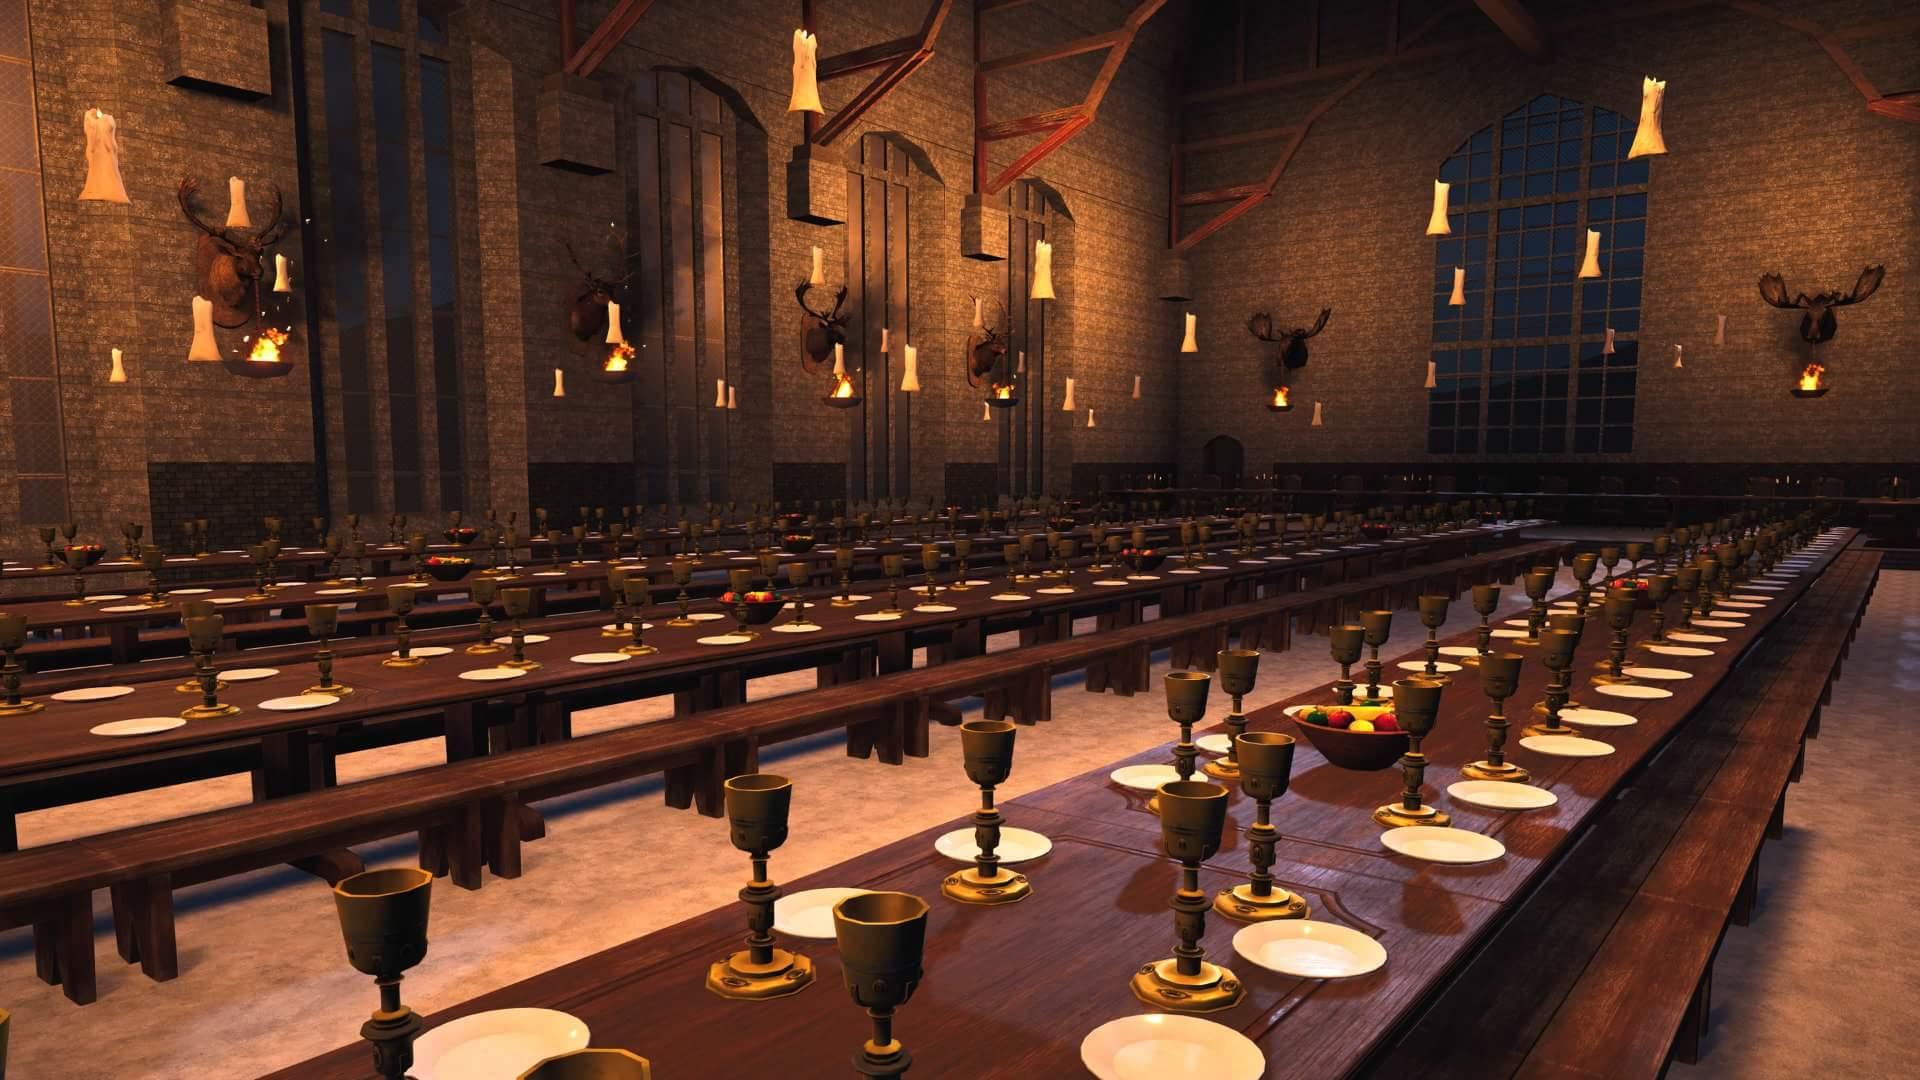 Hogwarts Great Hall Wallpapers On Wallpaperdog